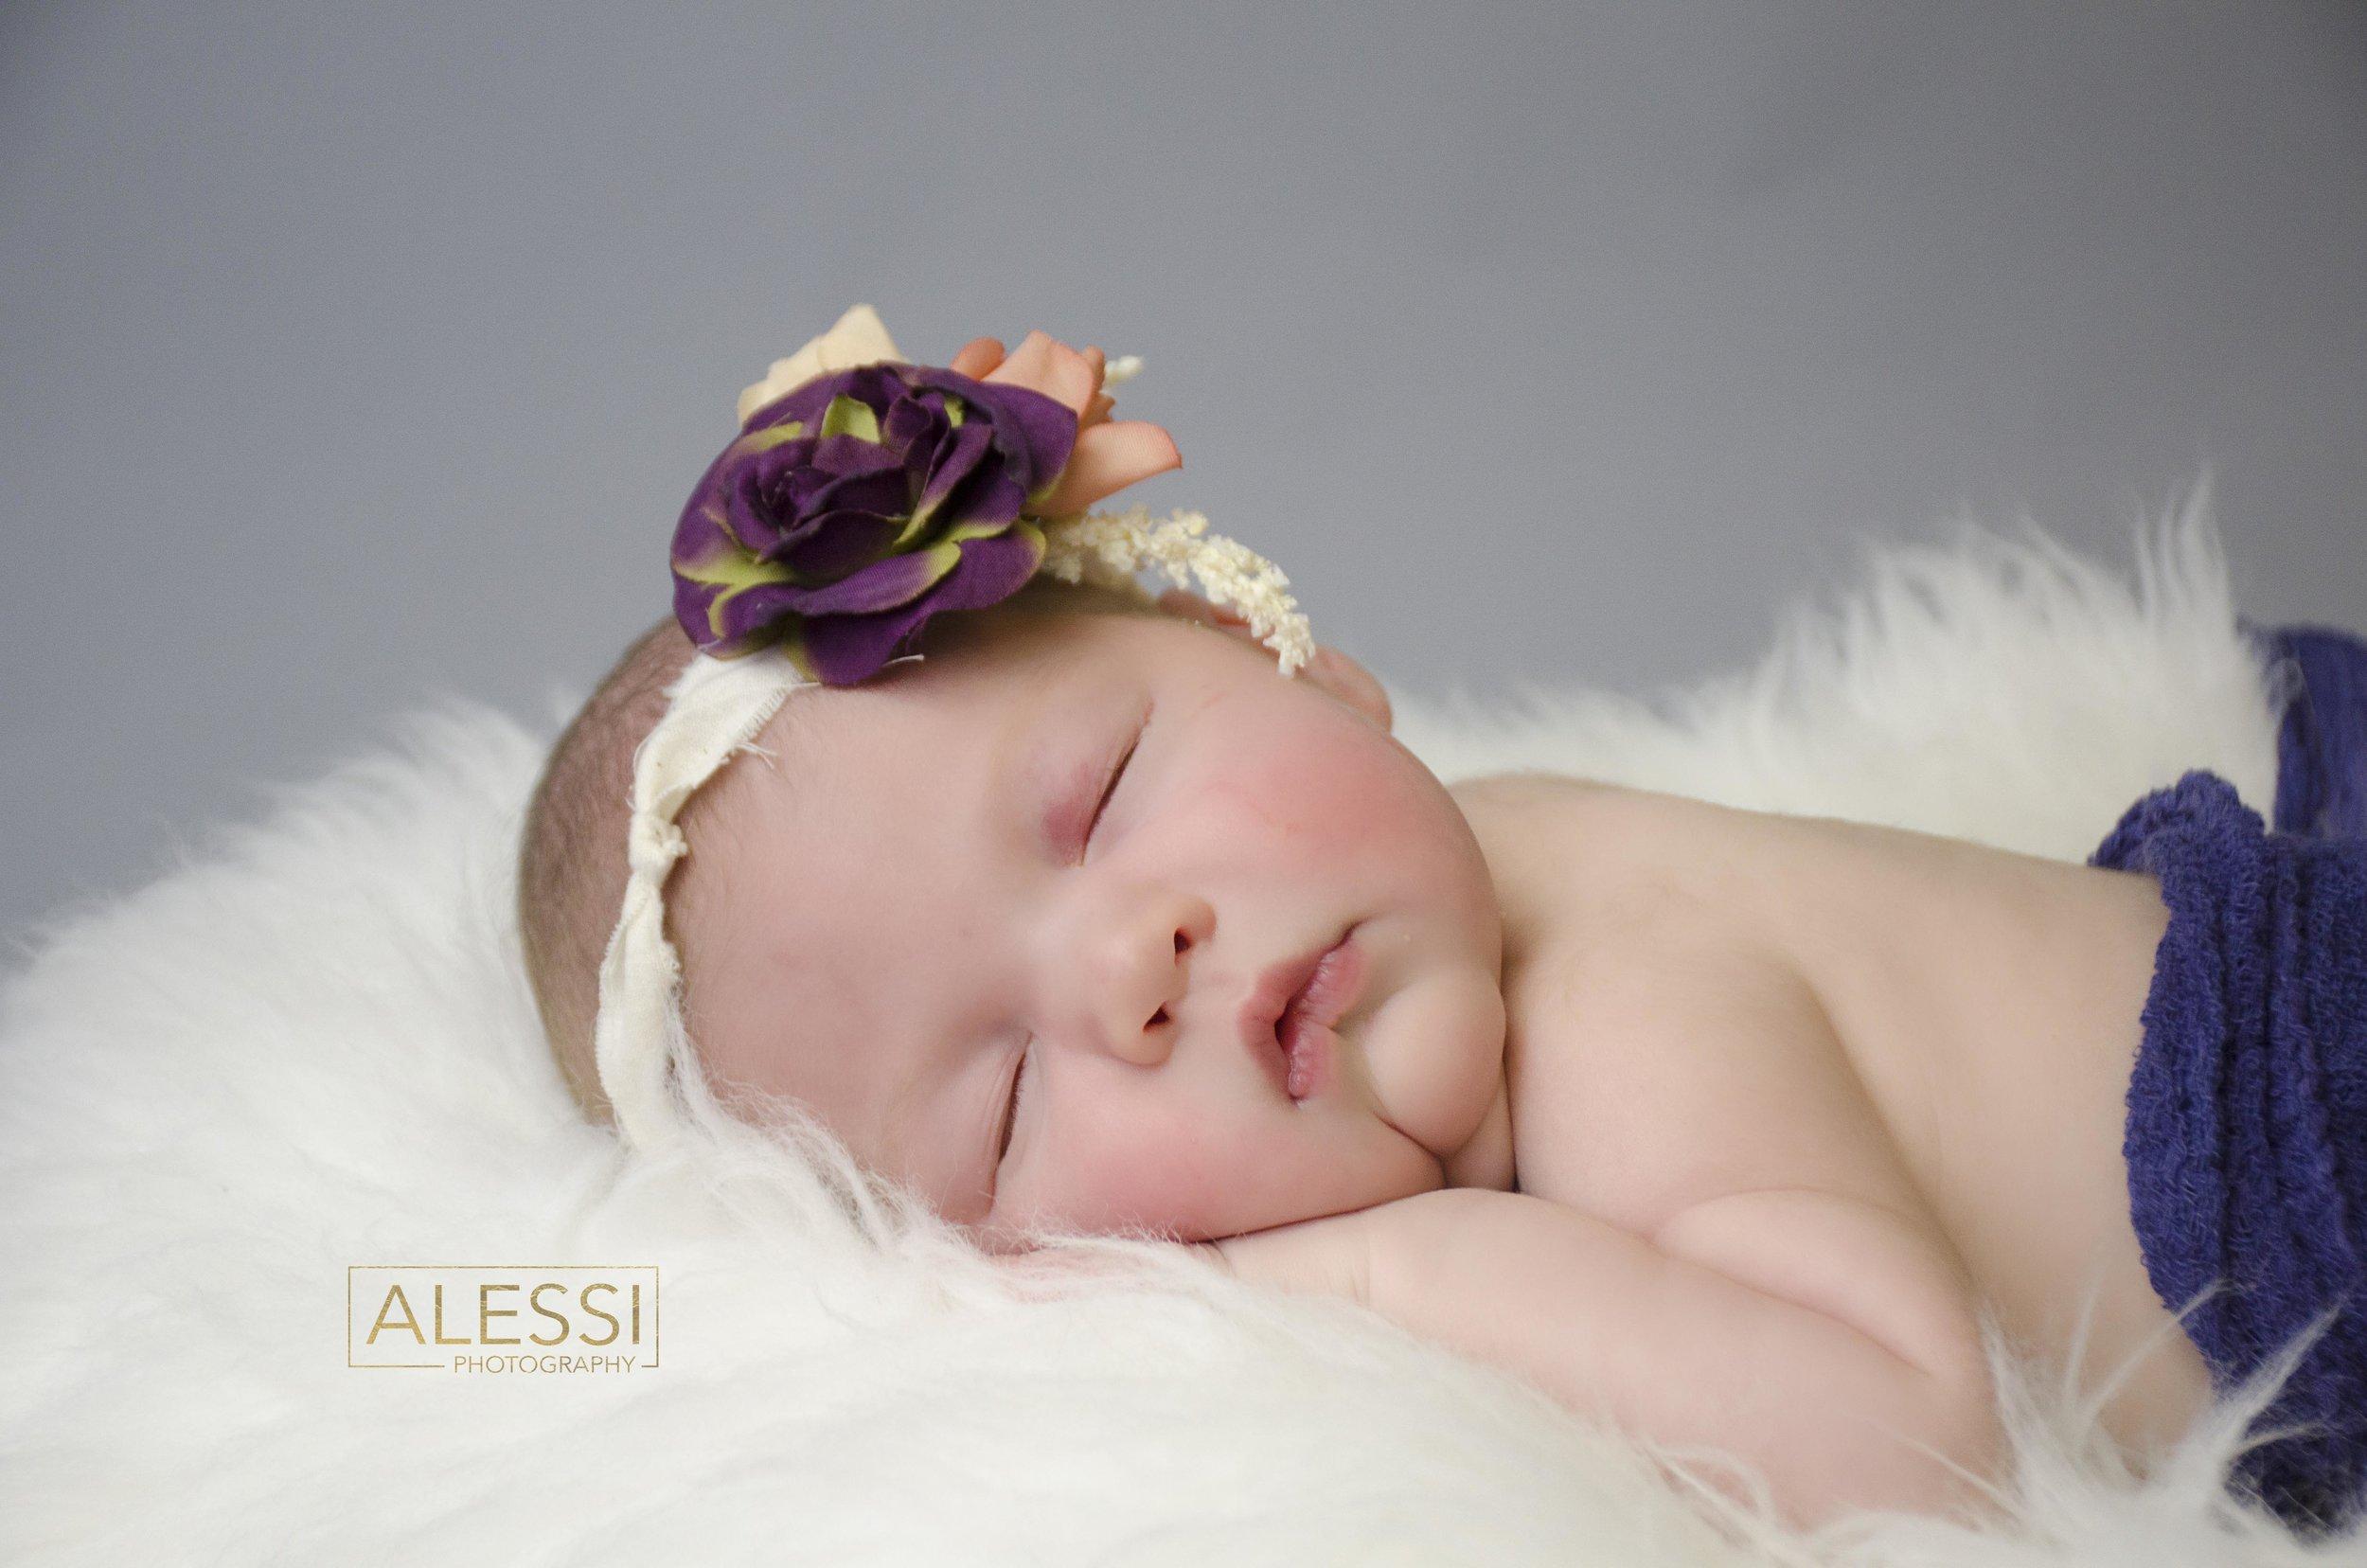 Newborn_P4 copy.jpg